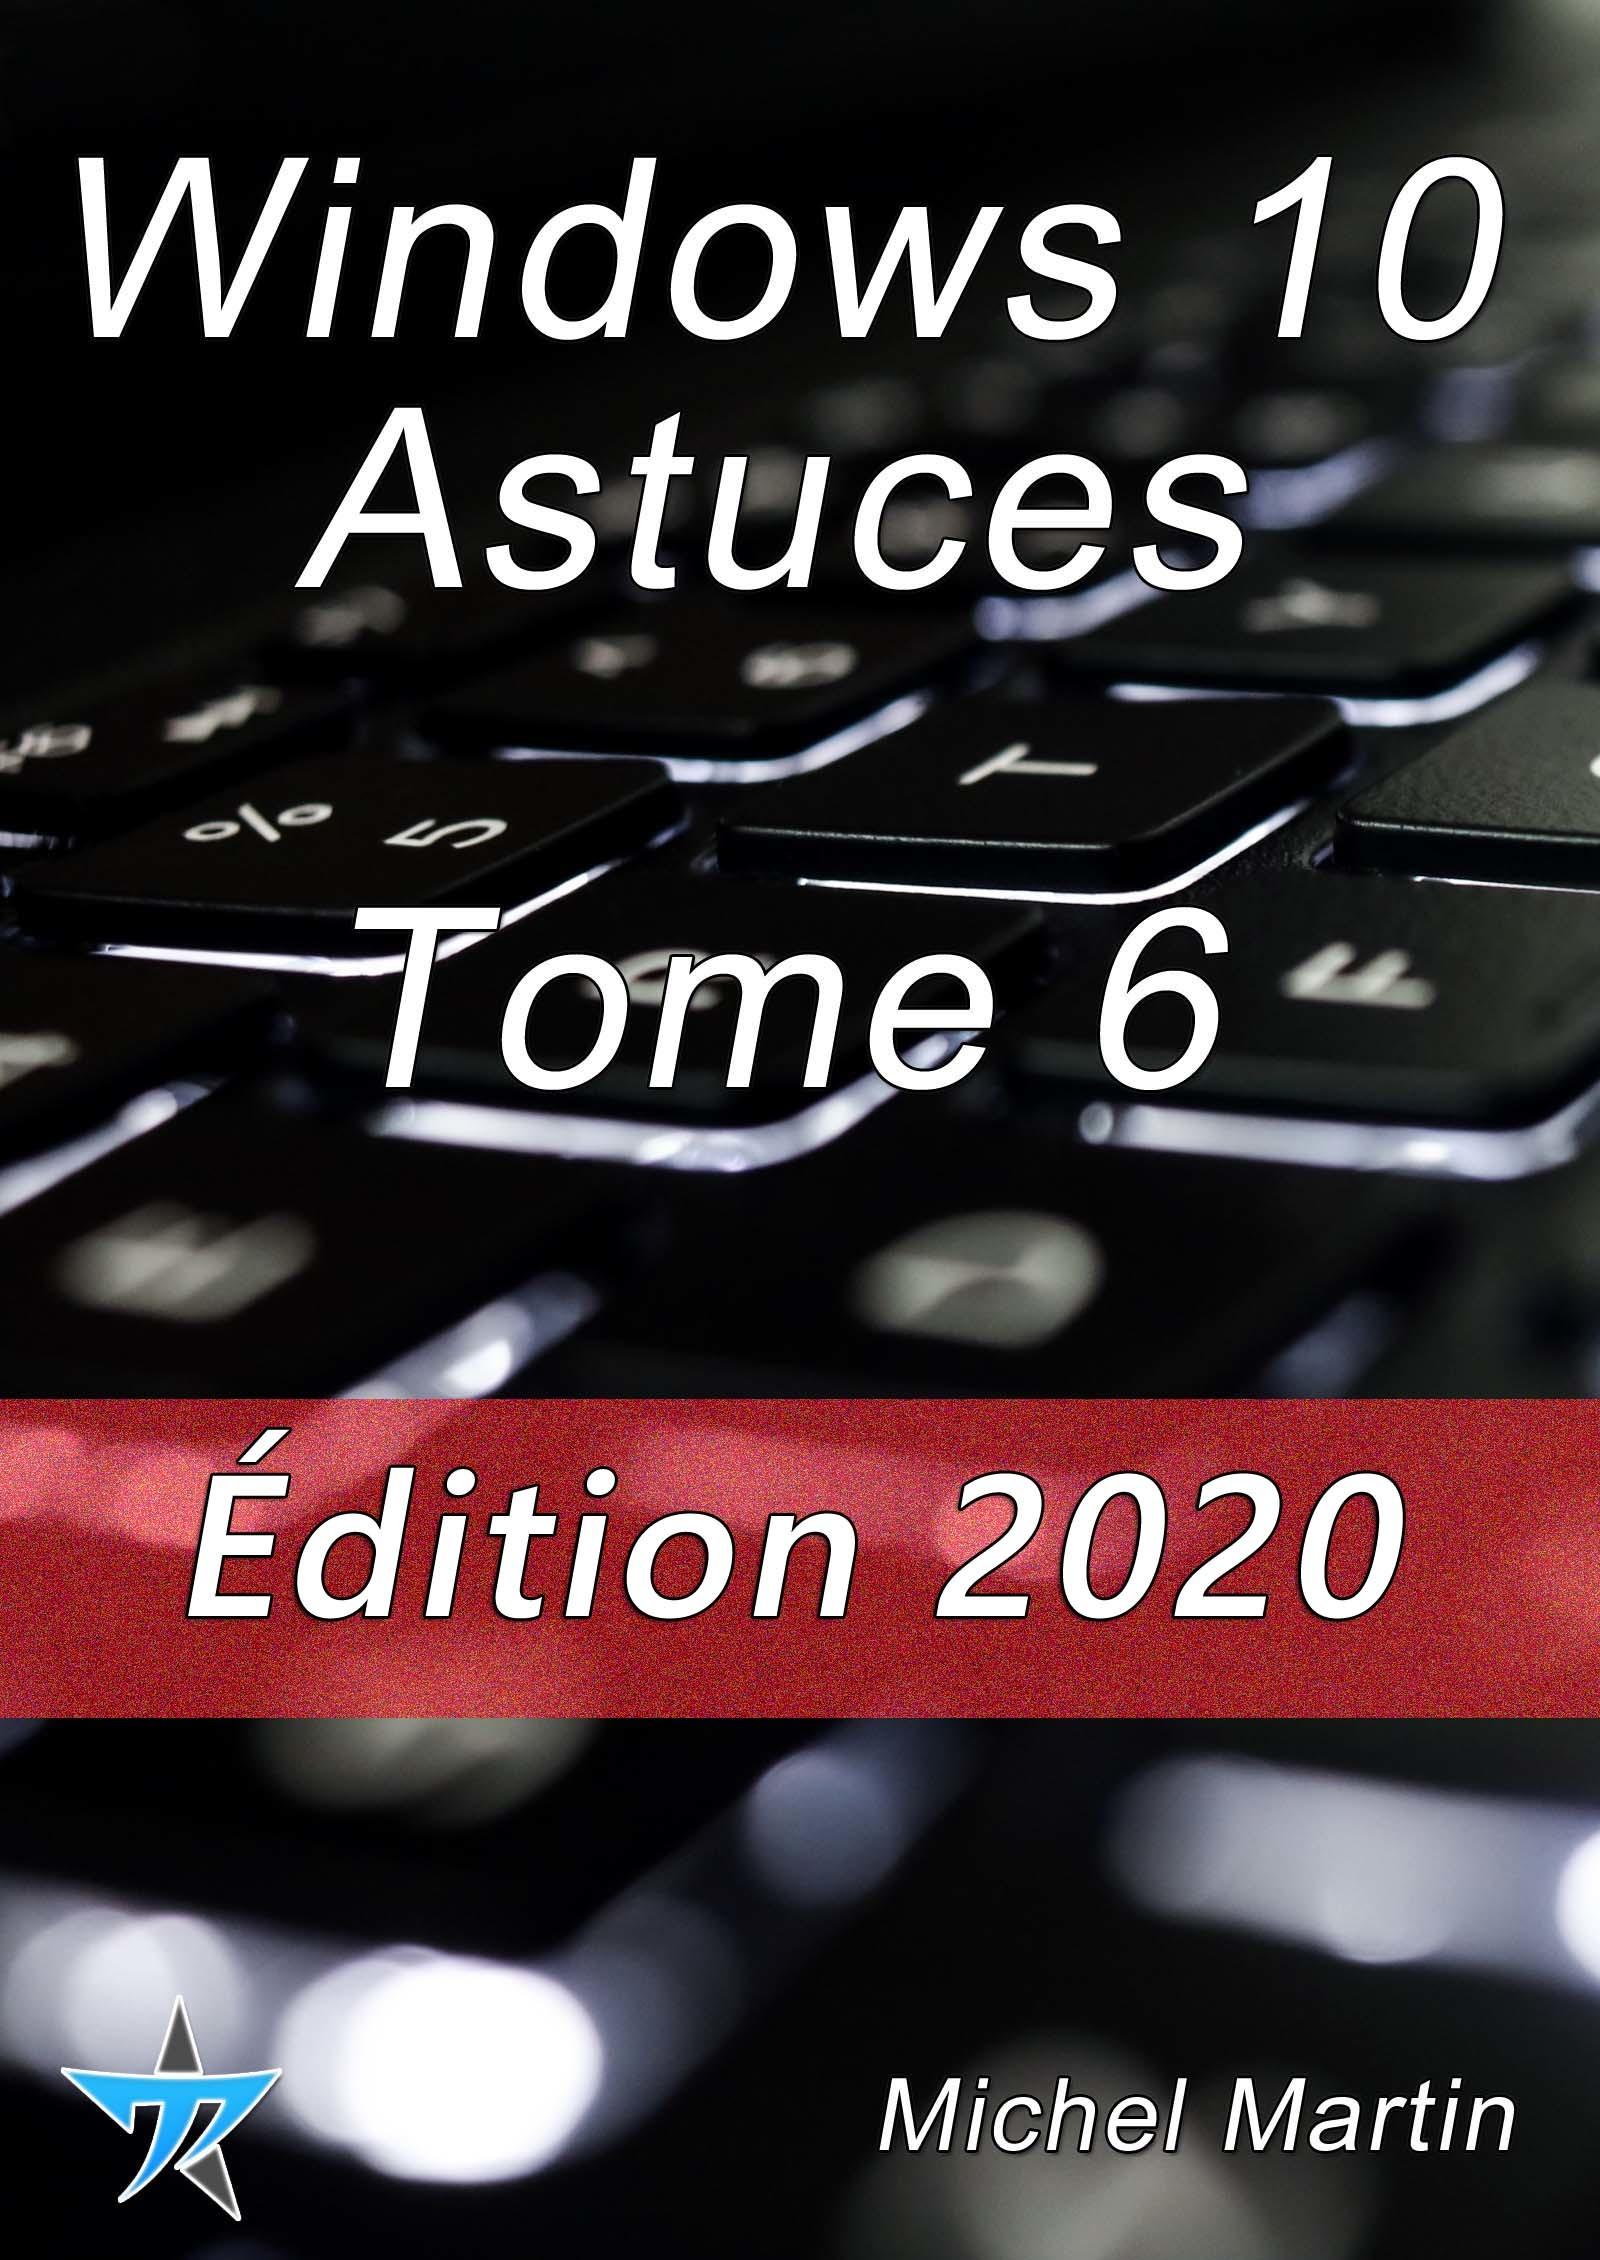 Windows 10 Astuces Tome 6